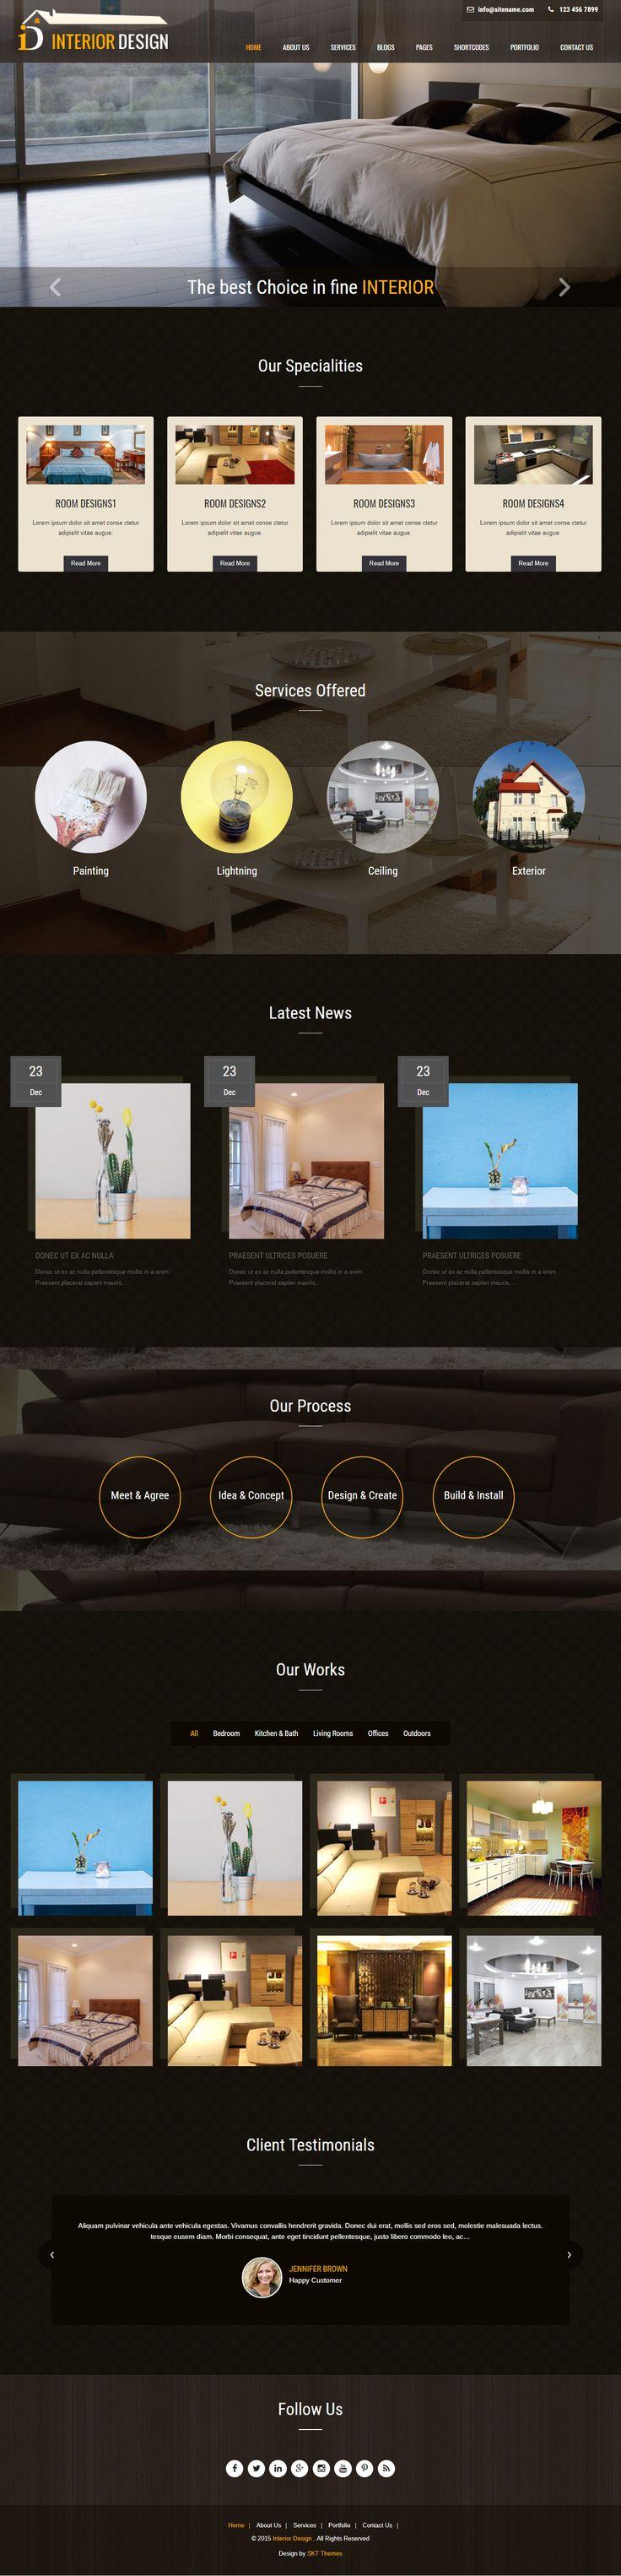 Free Interior Design WordPress Themes for Designing Websites